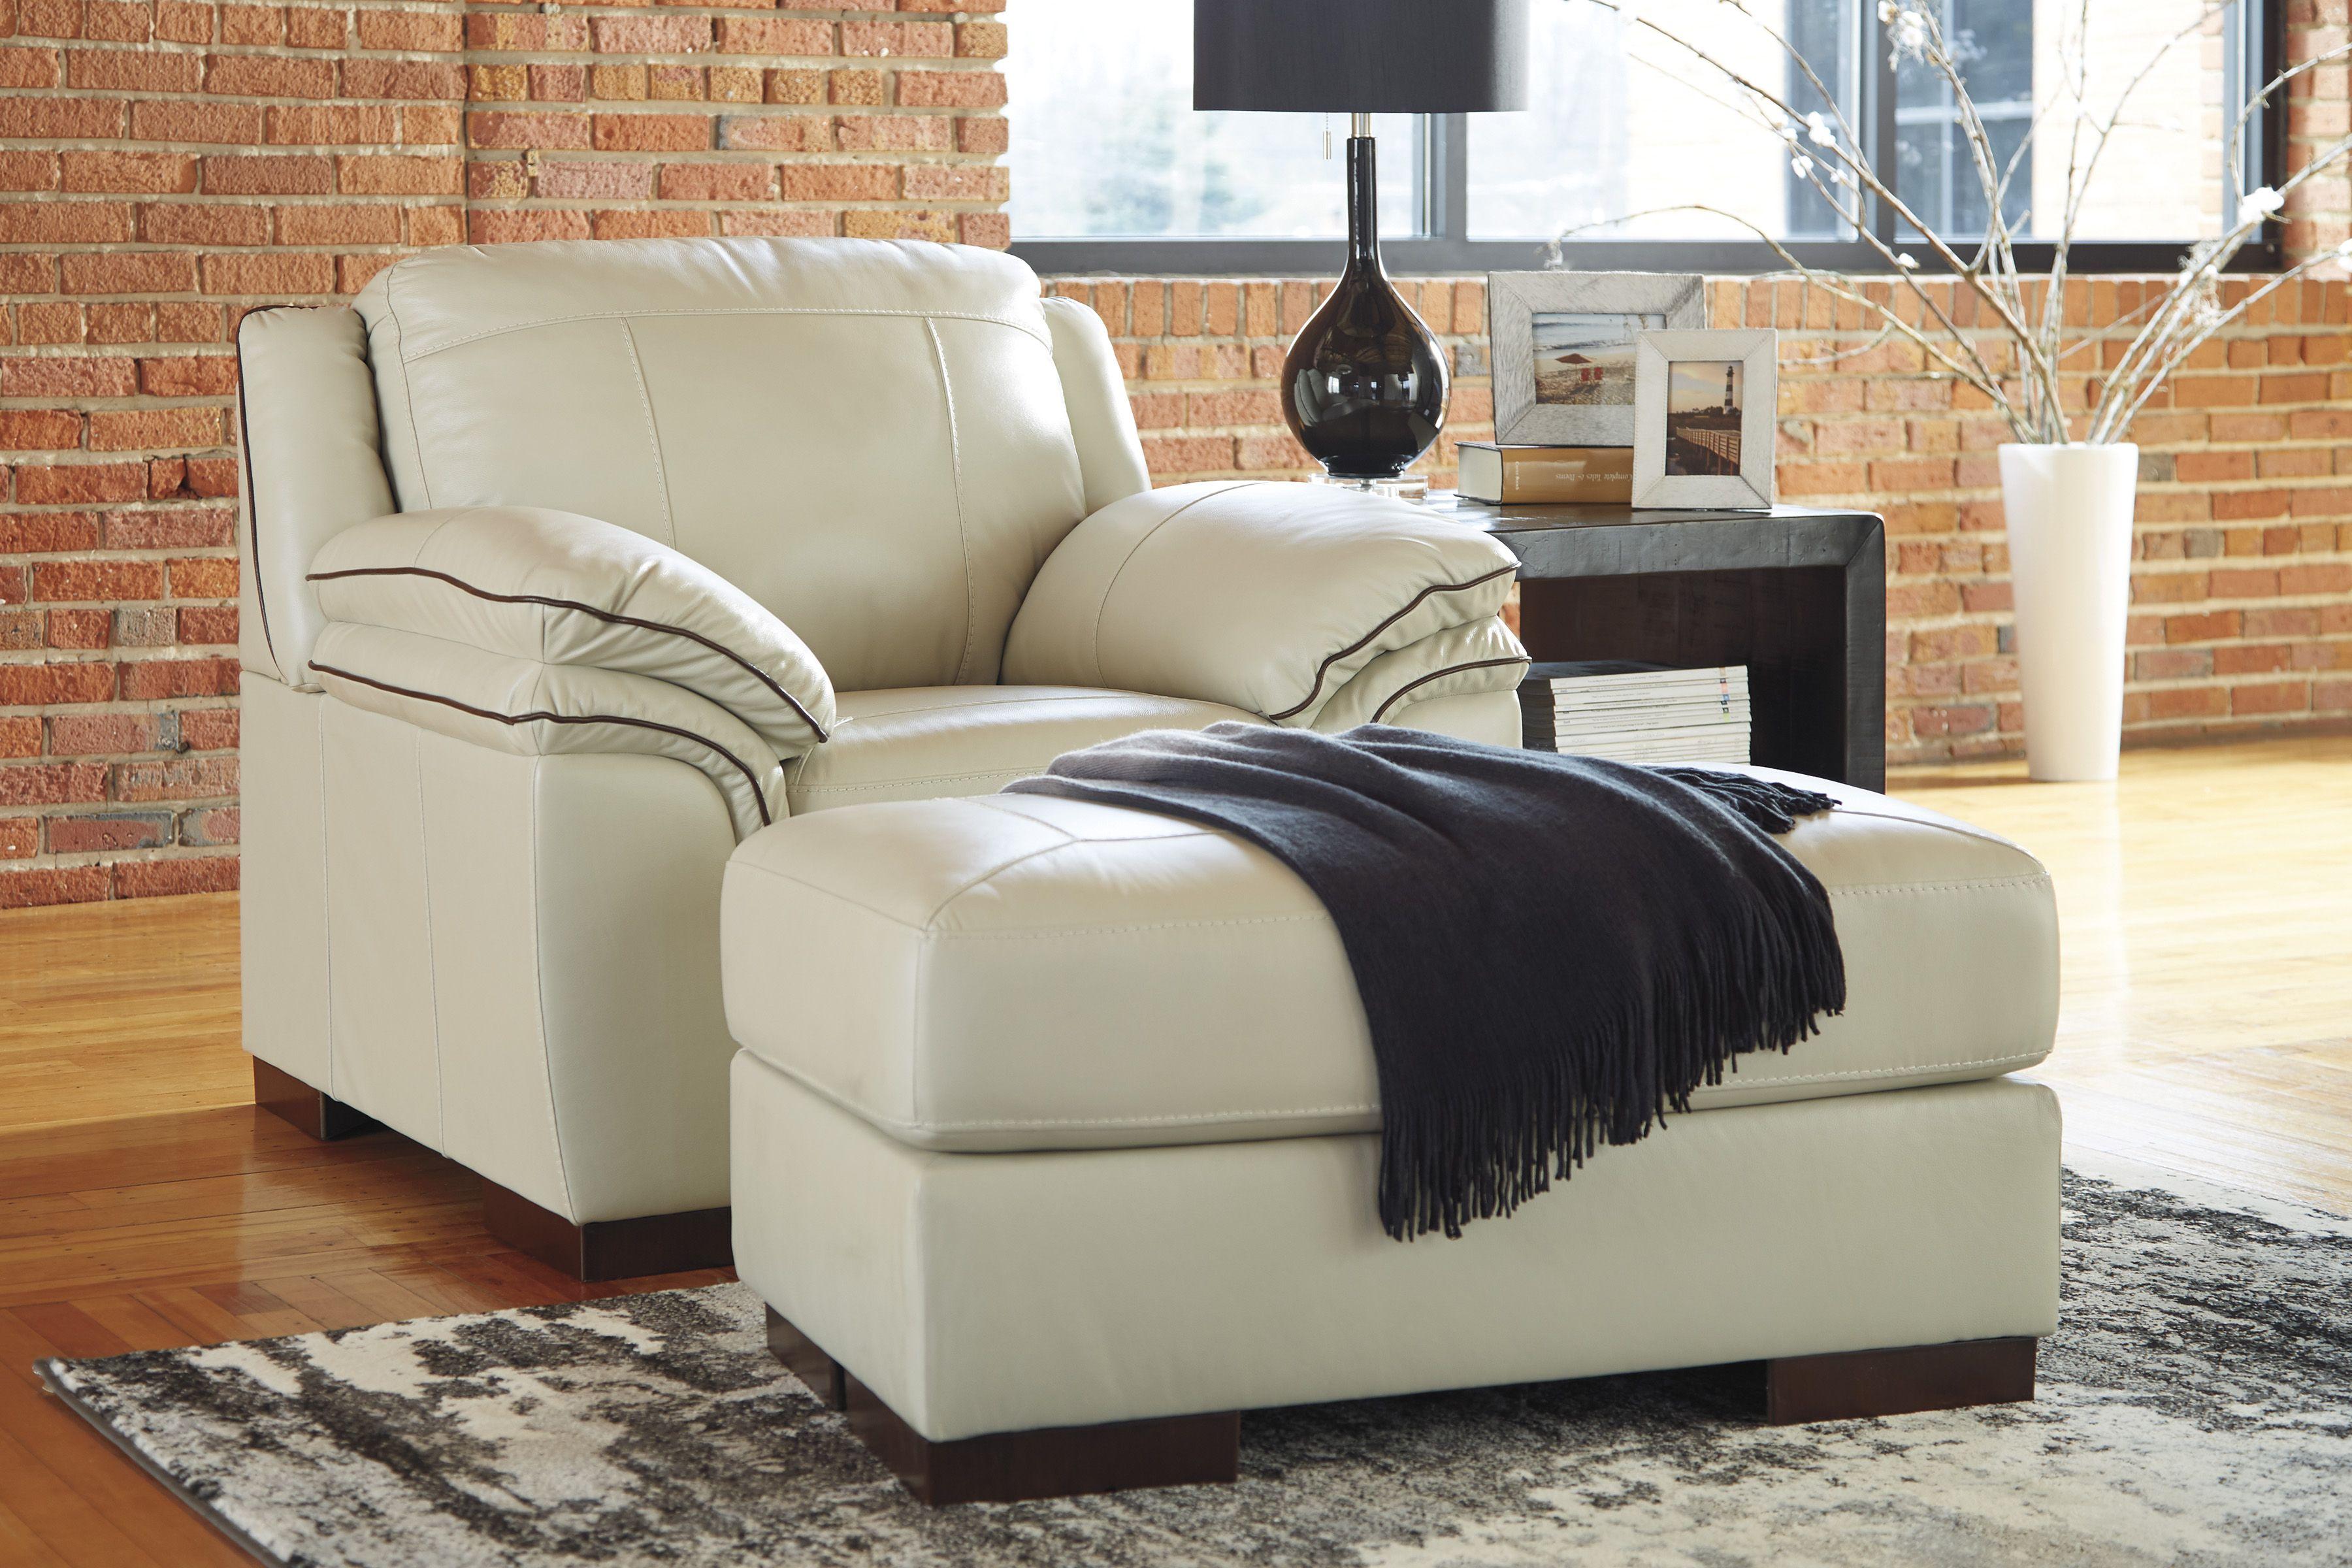 Islebrook Chair Indulge In Feel Good Luxury And Crisp